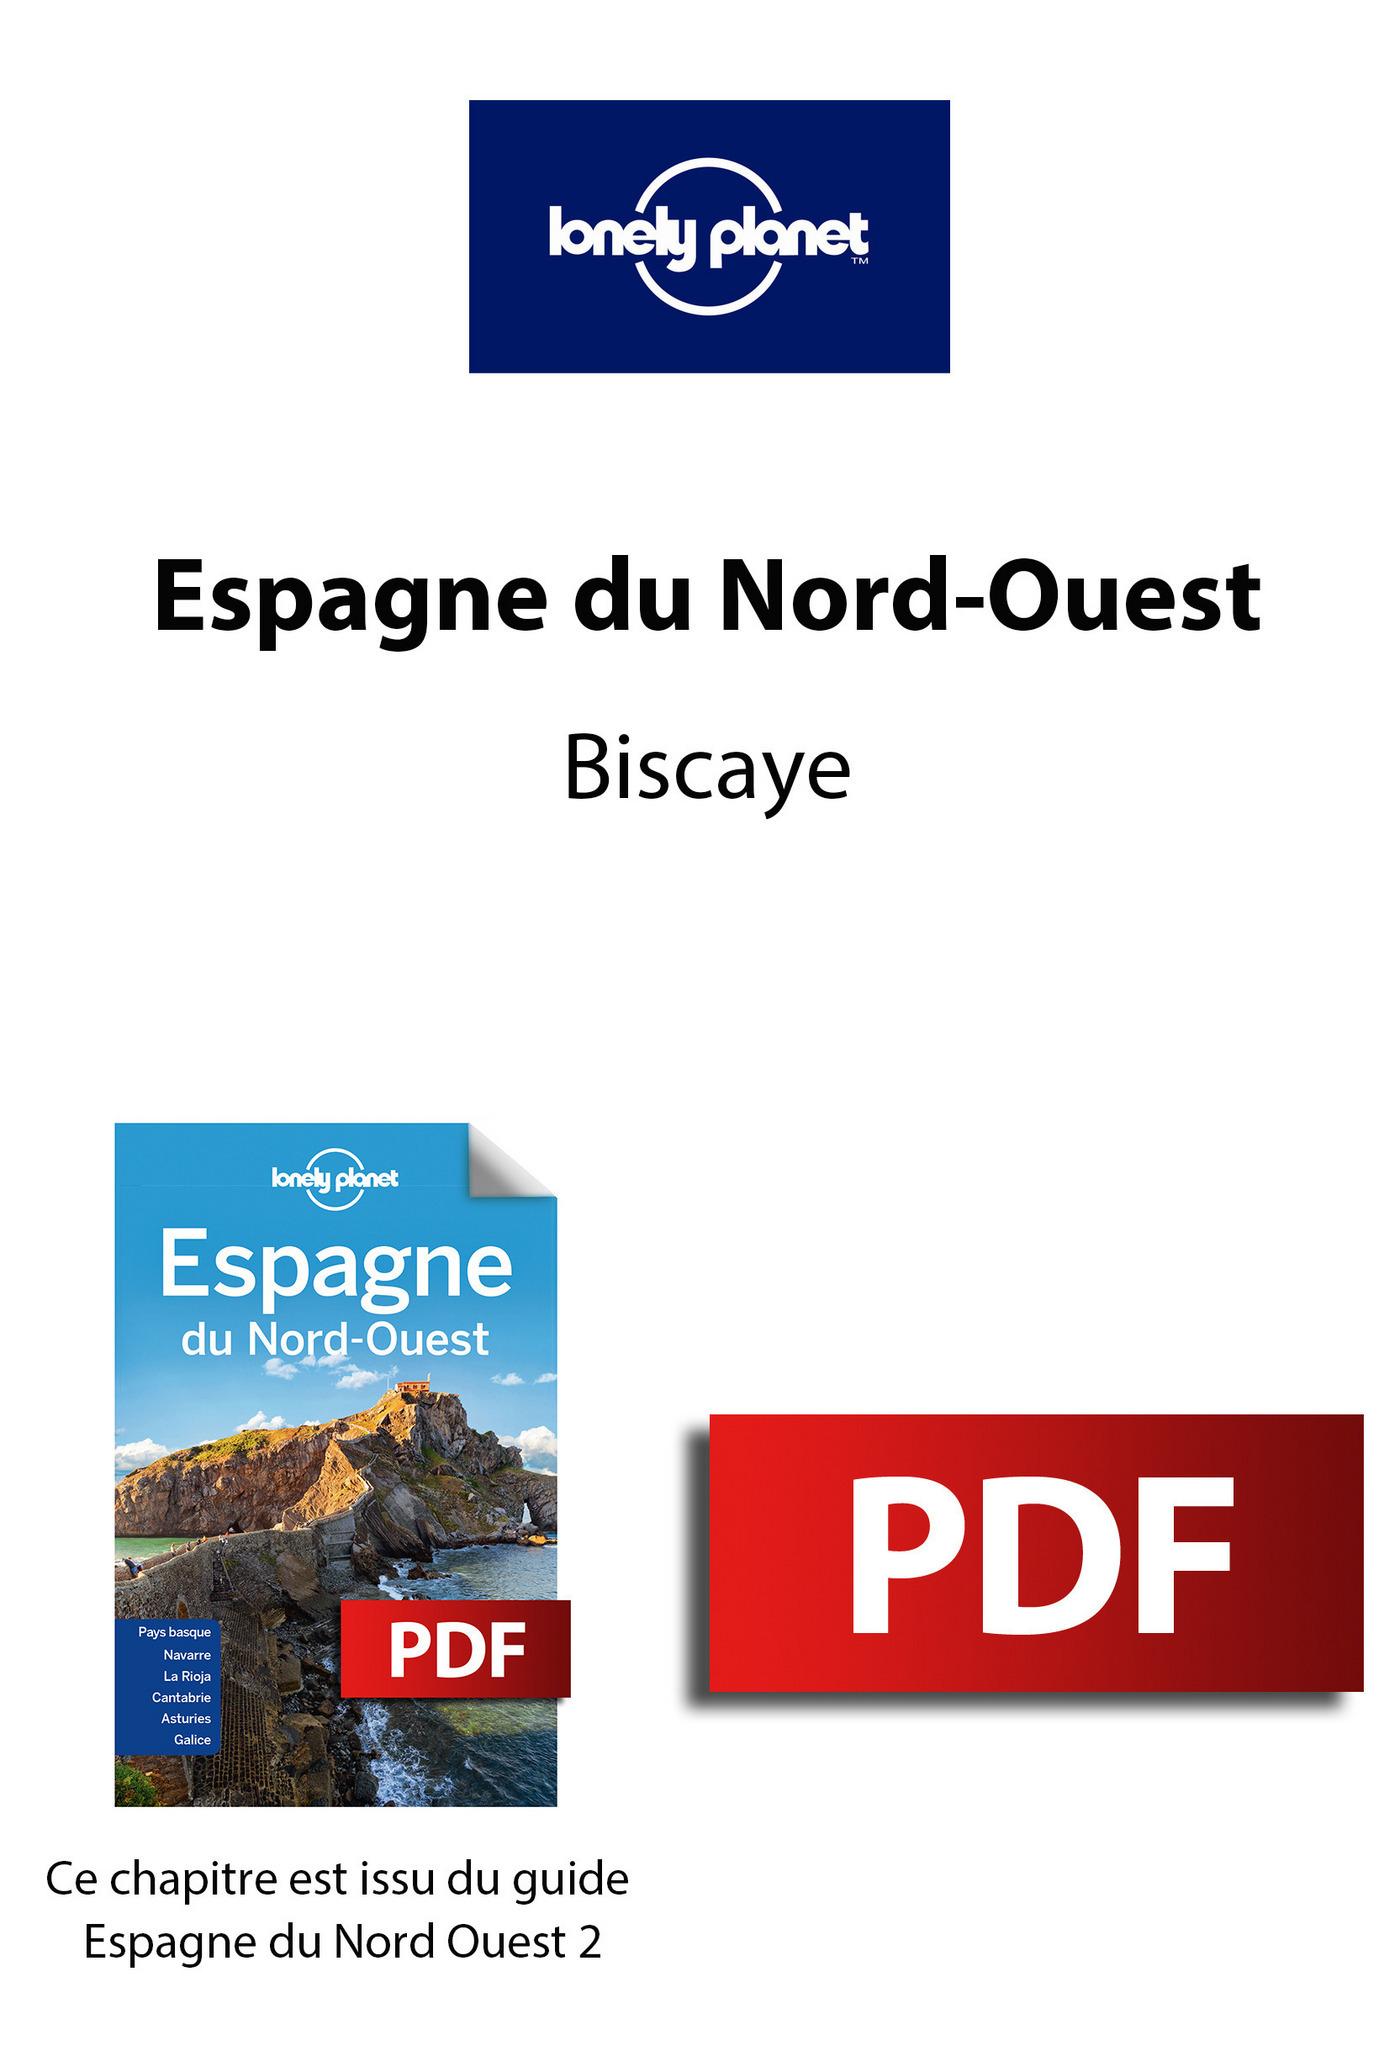 Espagne du Nord-Ouest - Biscaye